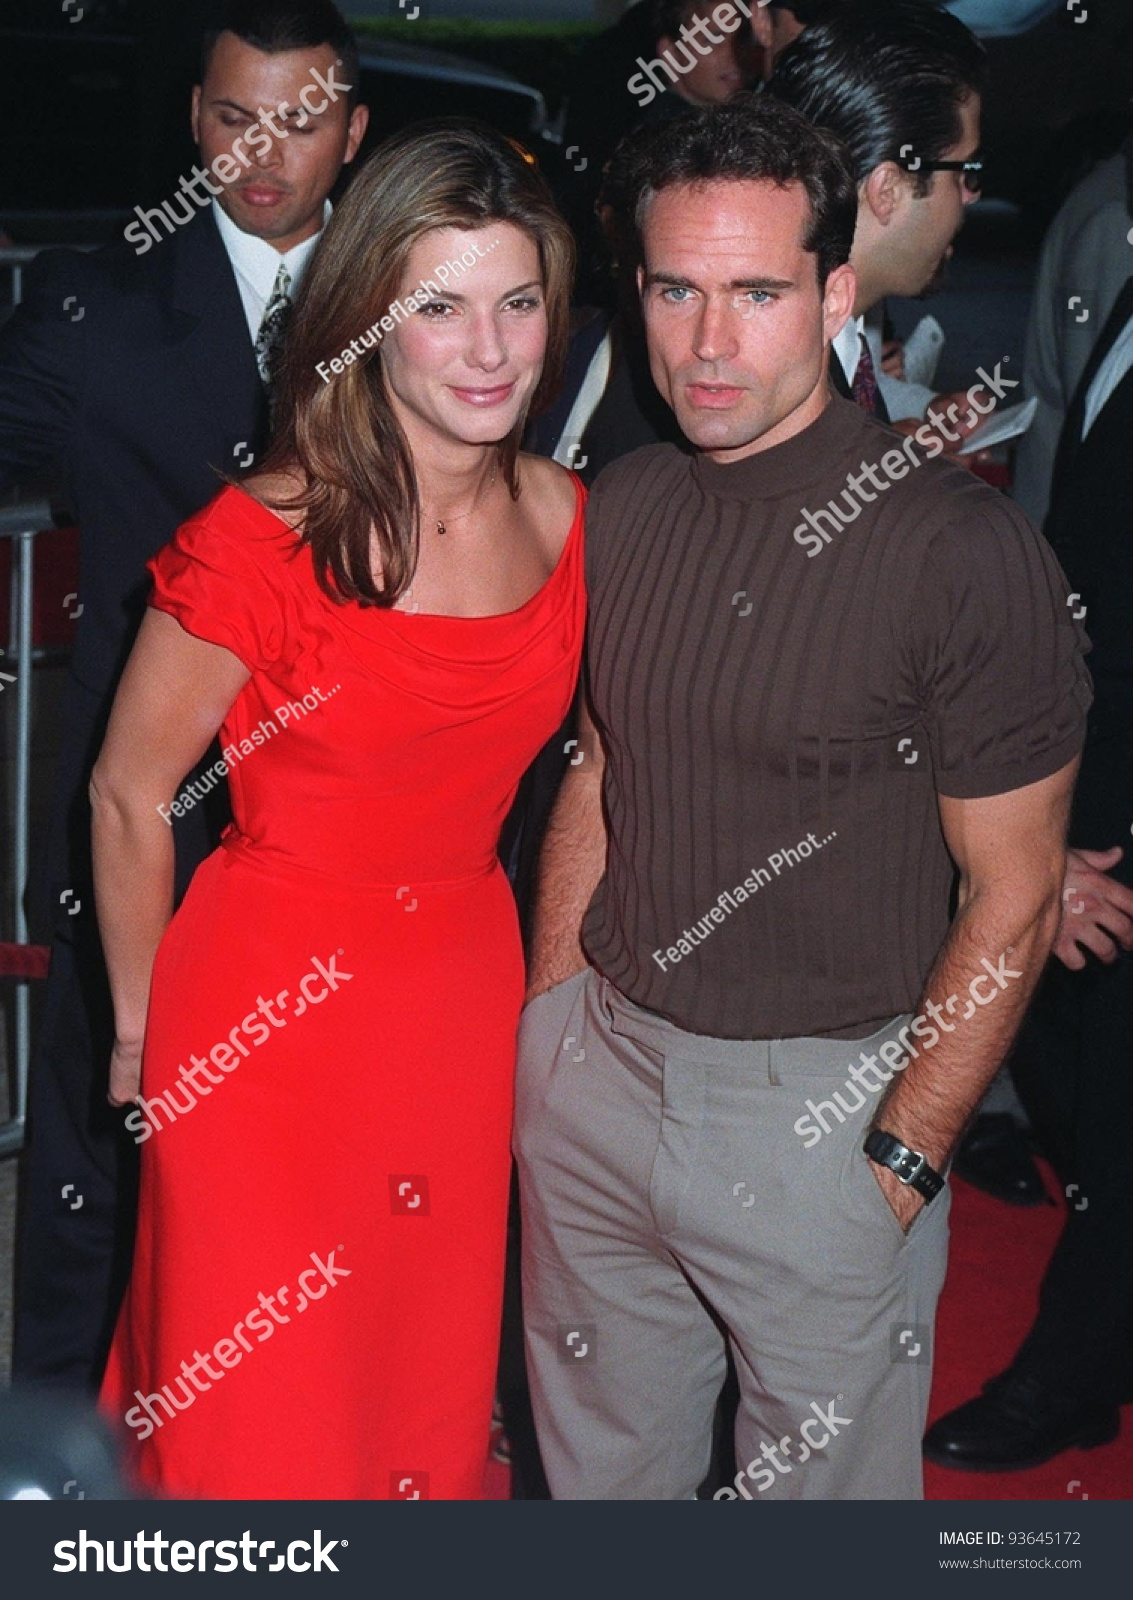 09jun97: Sandra Bullock & Jason Patric At The Premiere Of ...